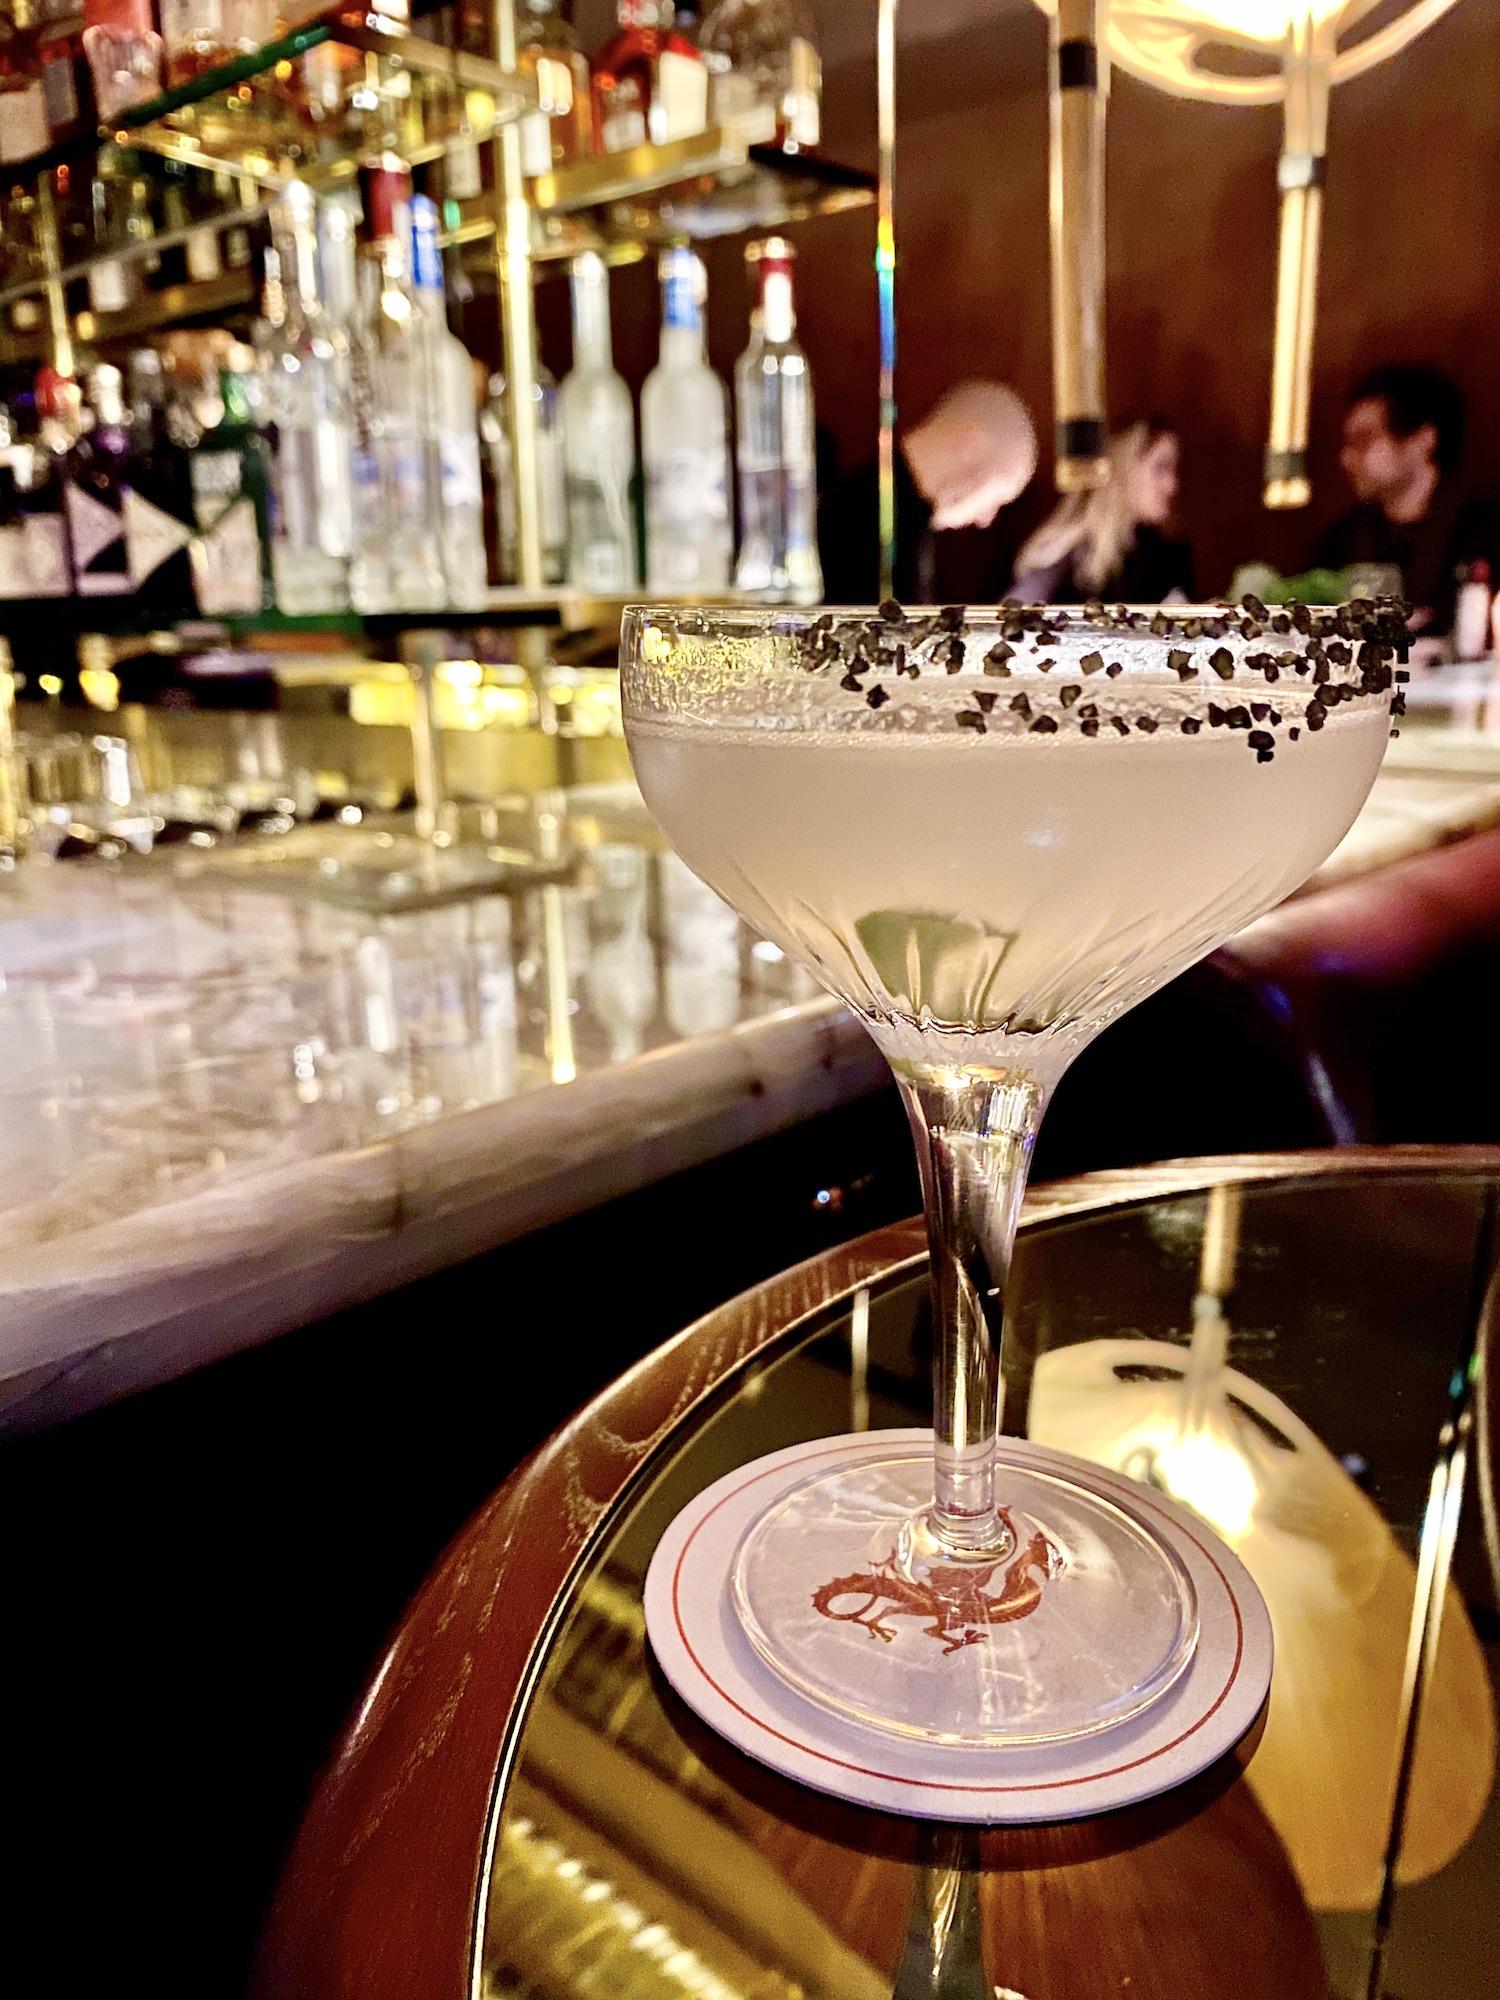 Margarita at Cyril Lignac's Dragon Bar